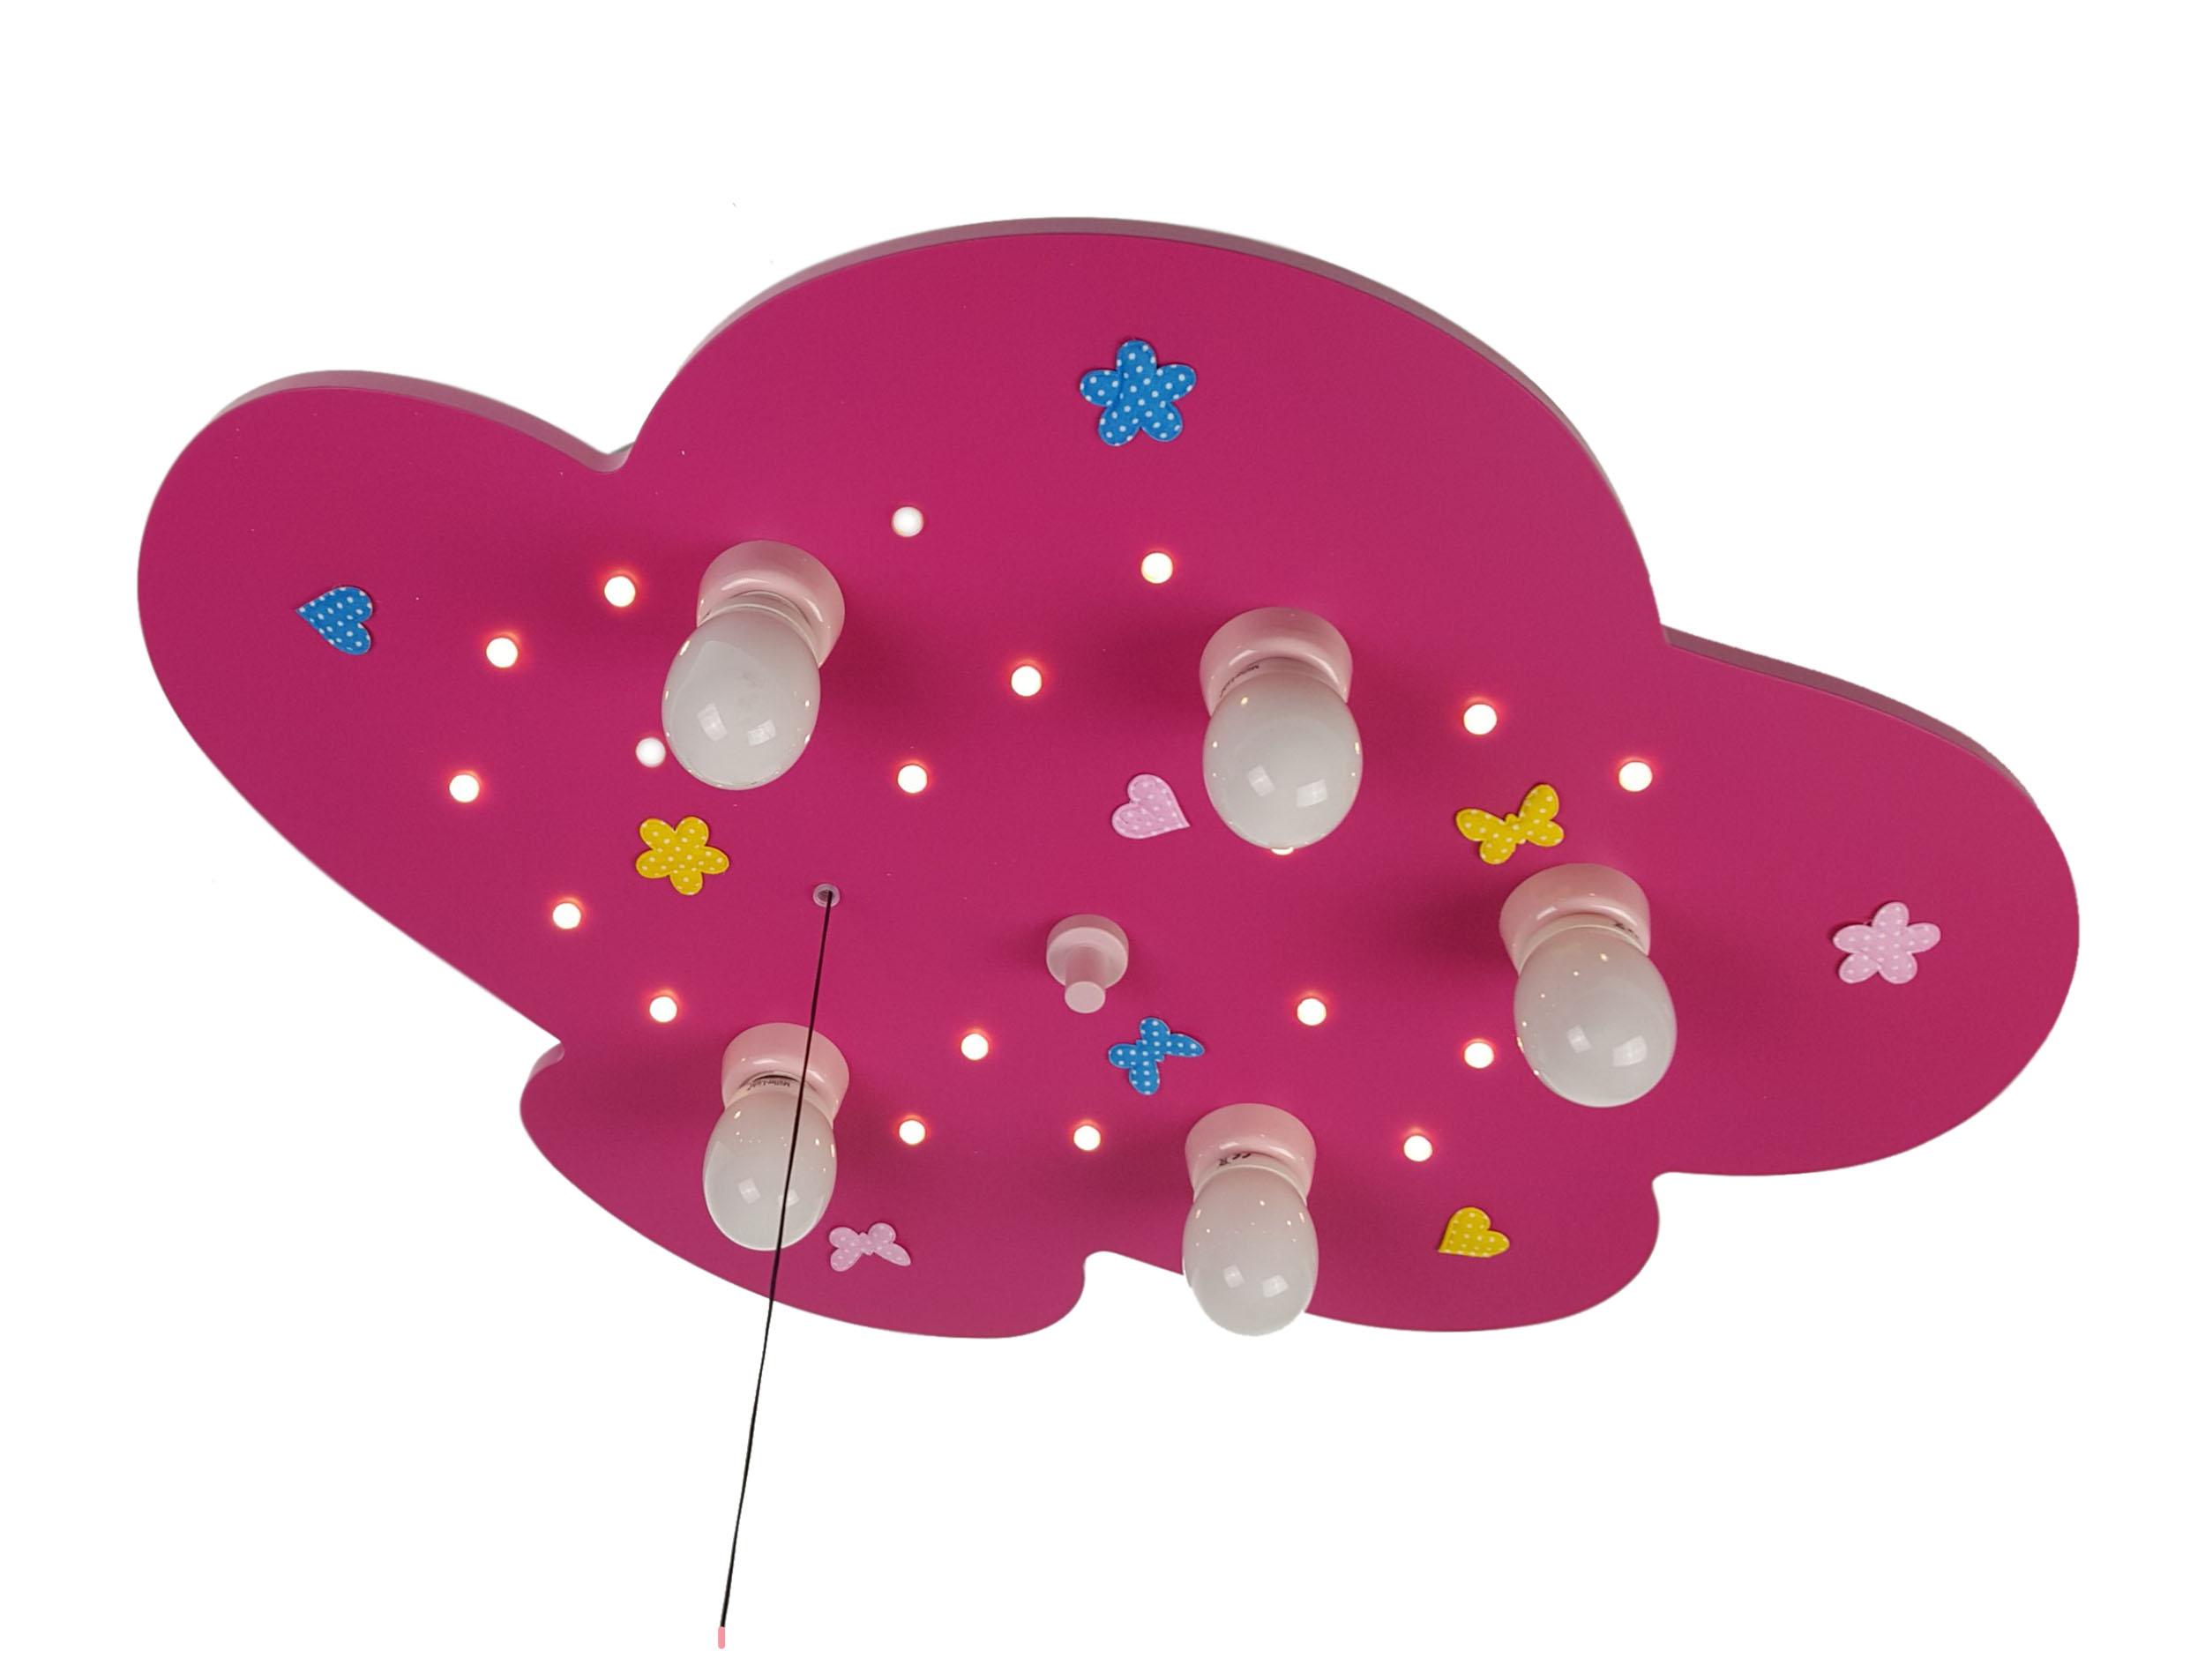 niermann deckenlampe wolke mit blumenwiese magenta led kinderlampen im kinderlampenland. Black Bedroom Furniture Sets. Home Design Ideas